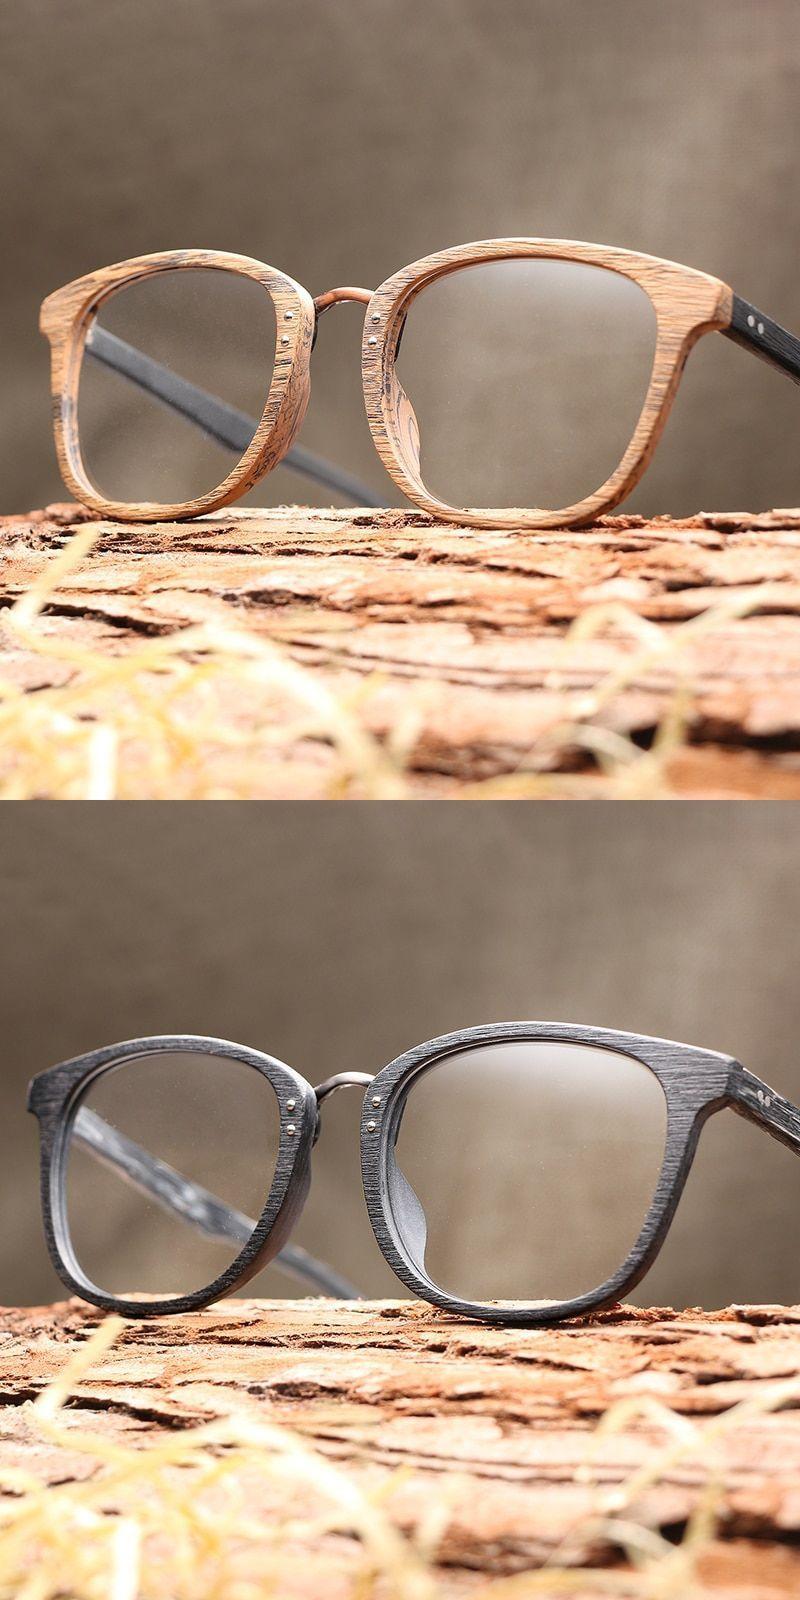 e50a2117c866 Men women myopia glasses wooden frame with clear lenses brand design  eyeglass  frames  eyewear  accessories  men women  acetate  wooden alloy   solid  round ...